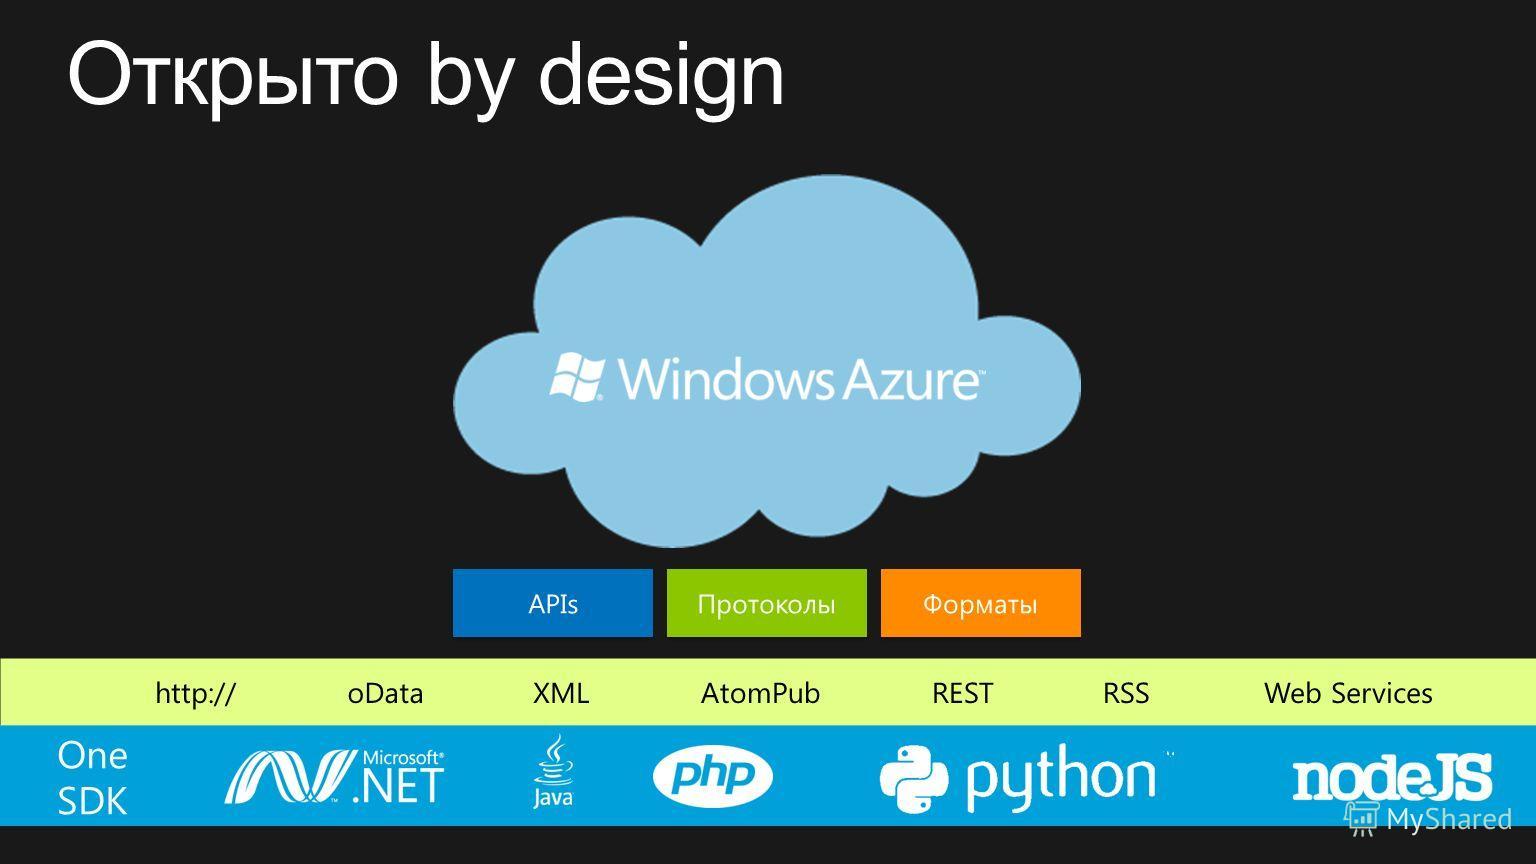 http://RESTWeb ServicesXMLoDataAtomPubRSS APIs Протоколы Форматы One SDK